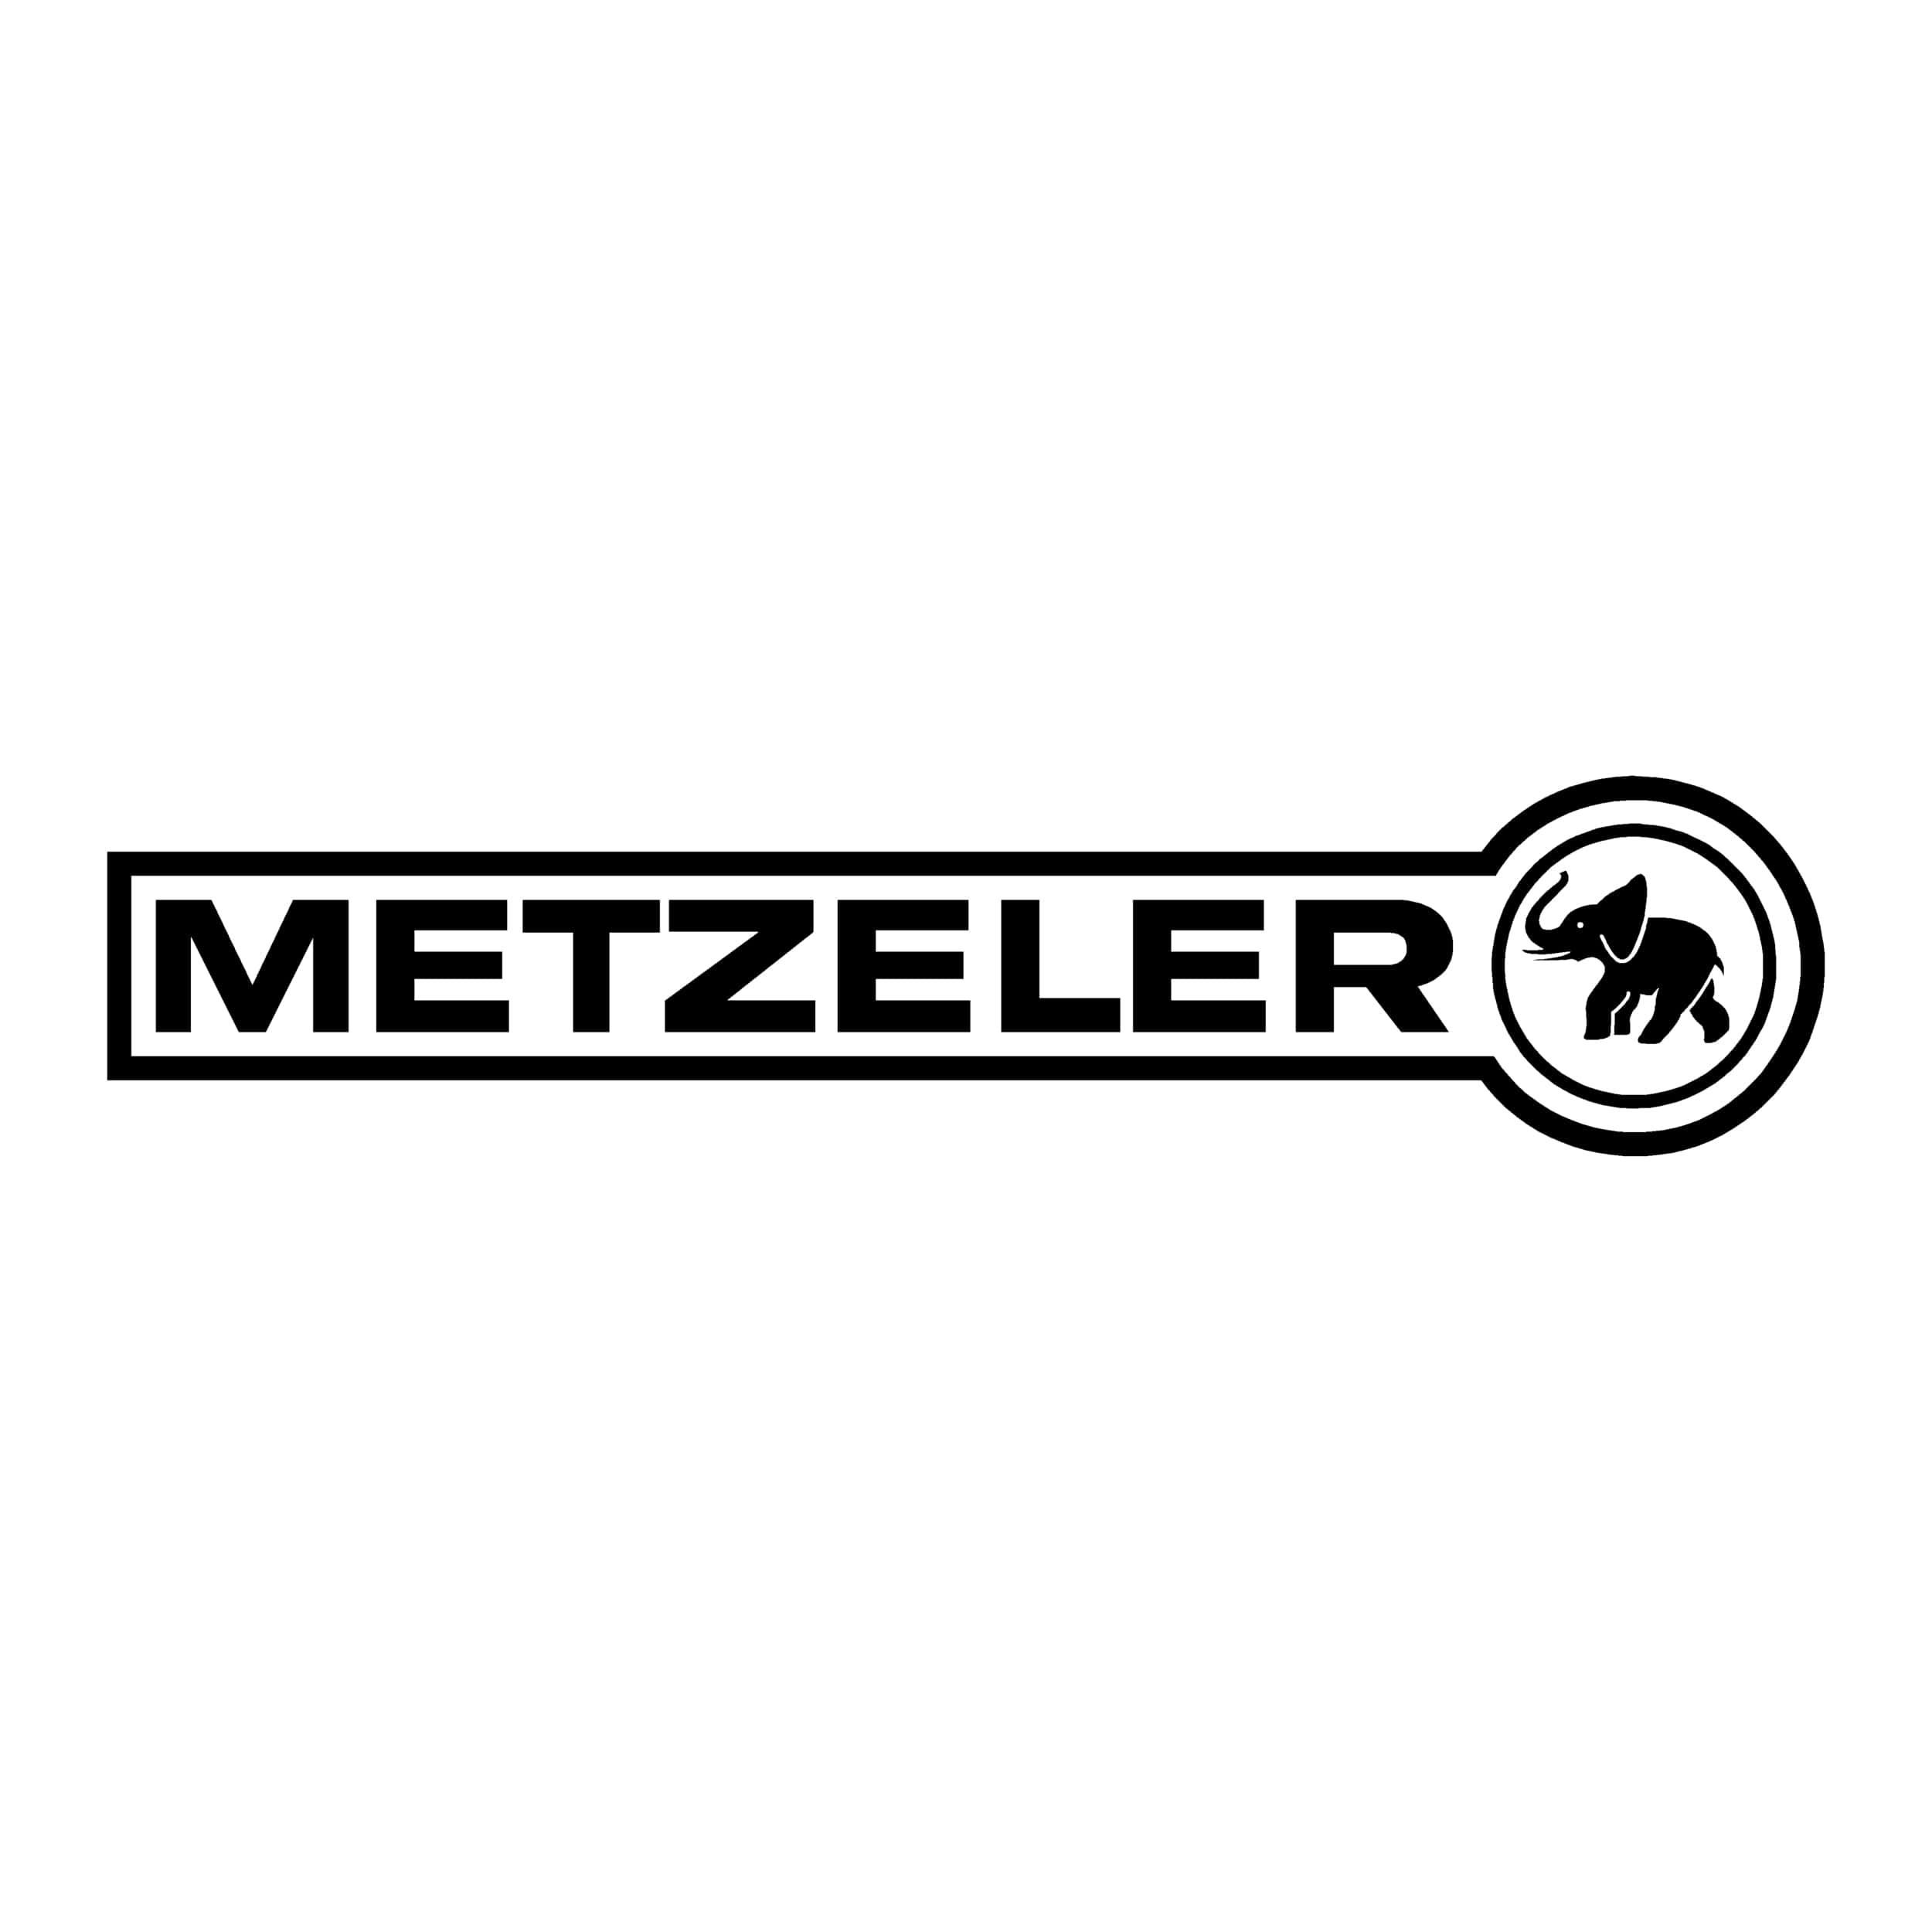 sticker-metzeler-ref-4-tuning-audio-sonorisation-car-auto-moto-camion-competition-deco-rallye-autocollant-min